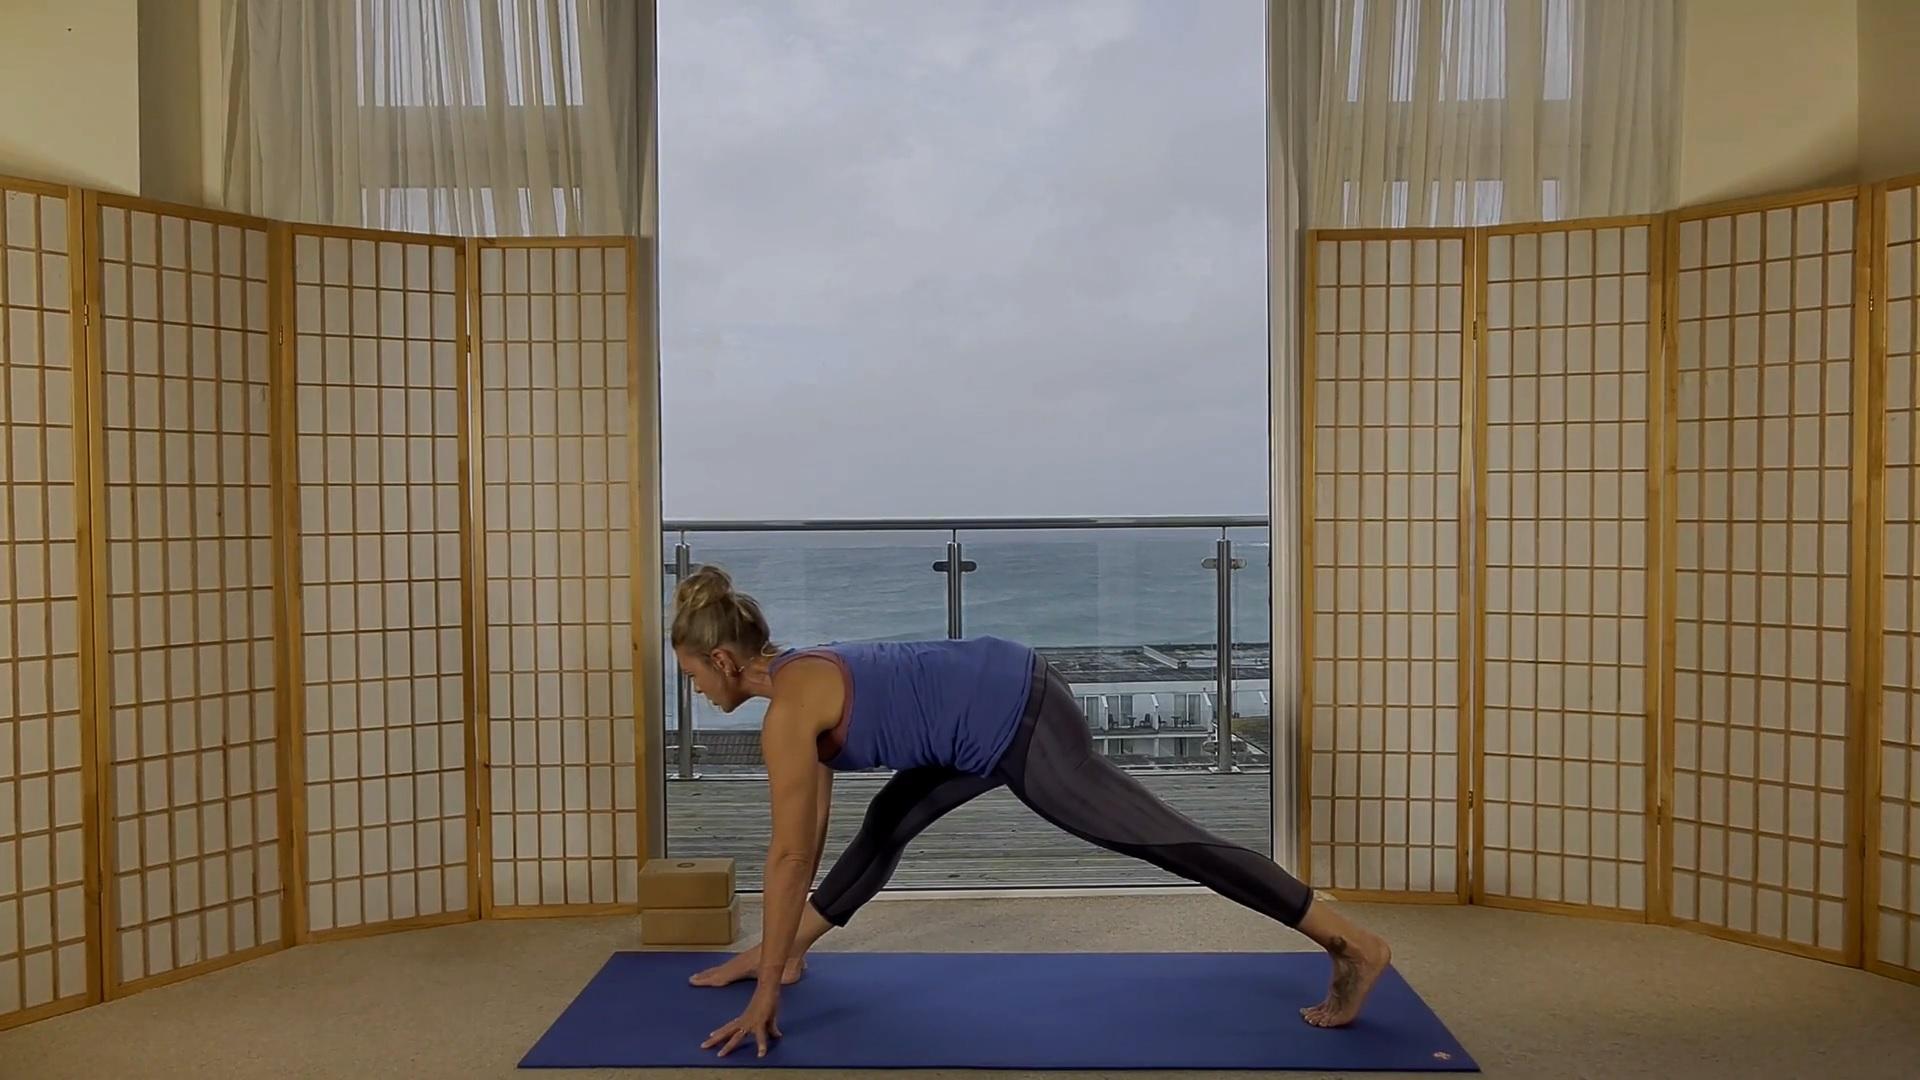 Oceanflow Yoga on demand hanuman vinyasa bhakti